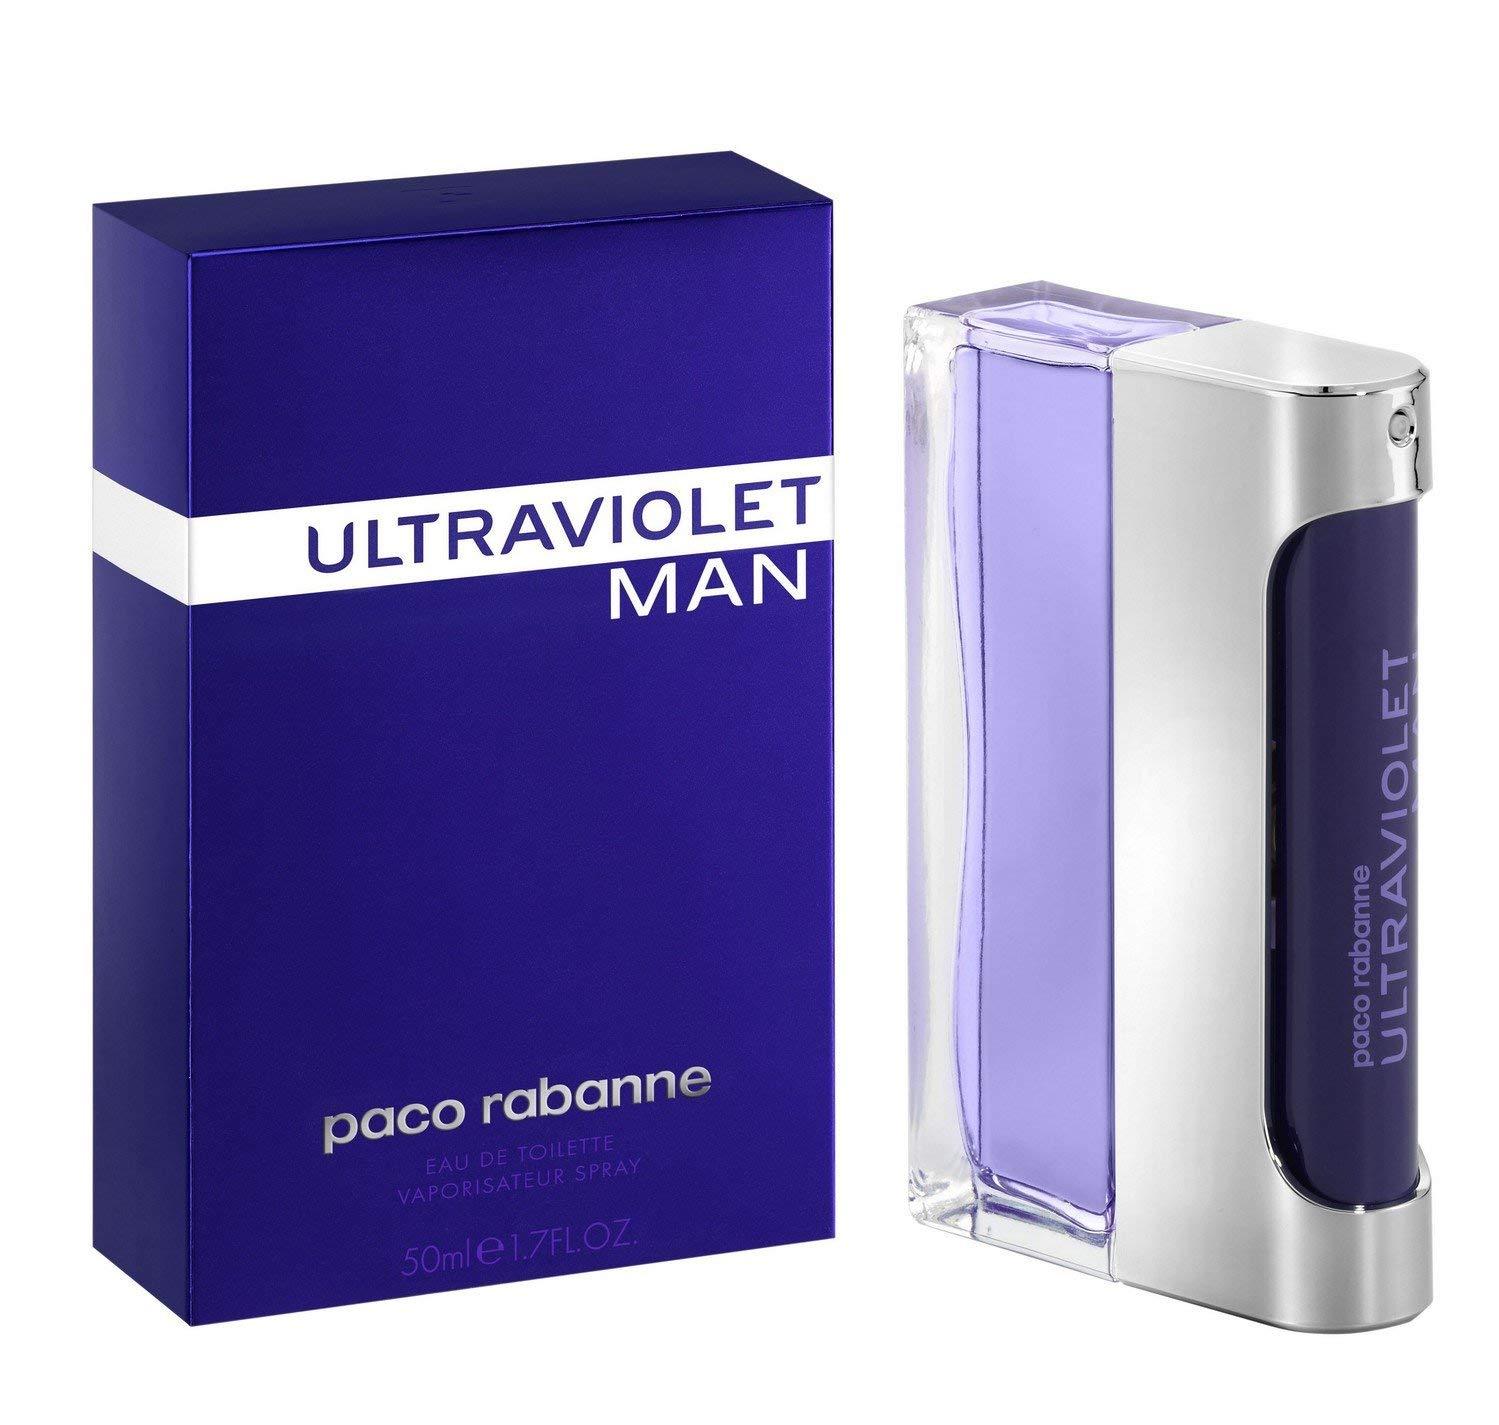 ultraviolet paco rabanne homme